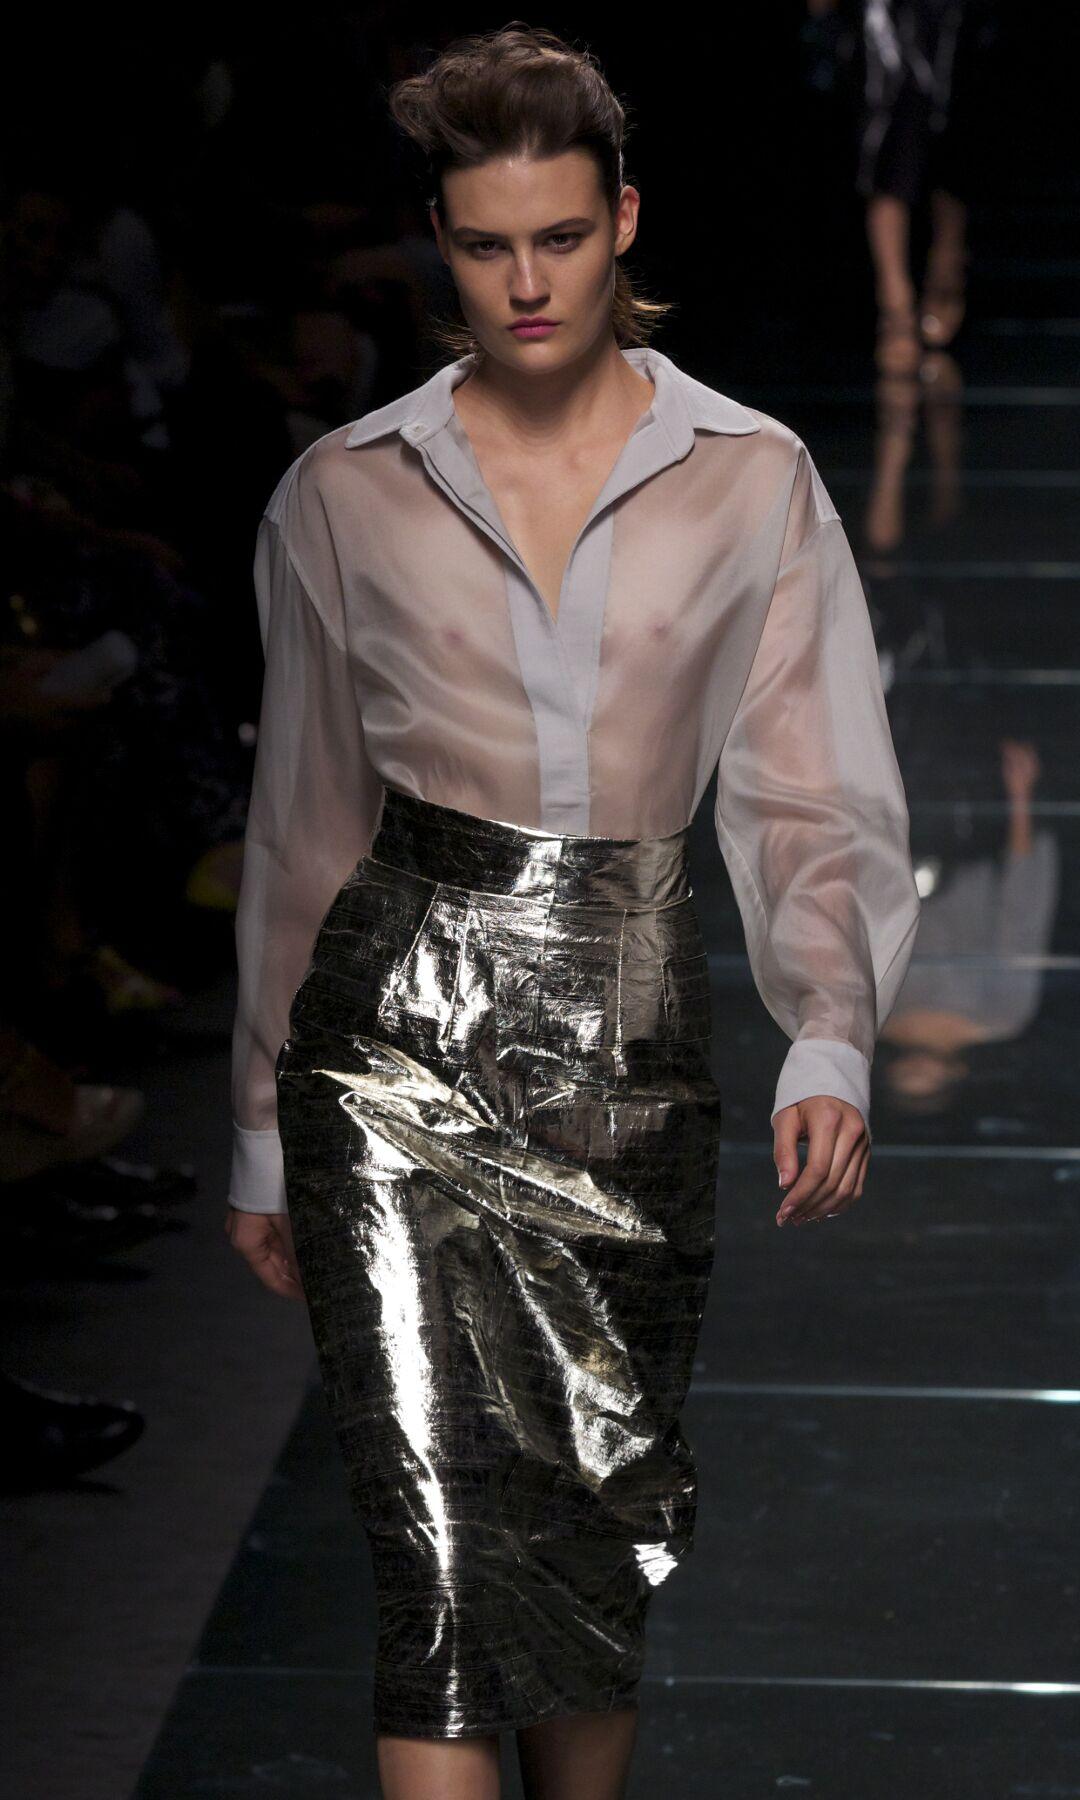 Anteprima Catwalk Fashion Trends Milan